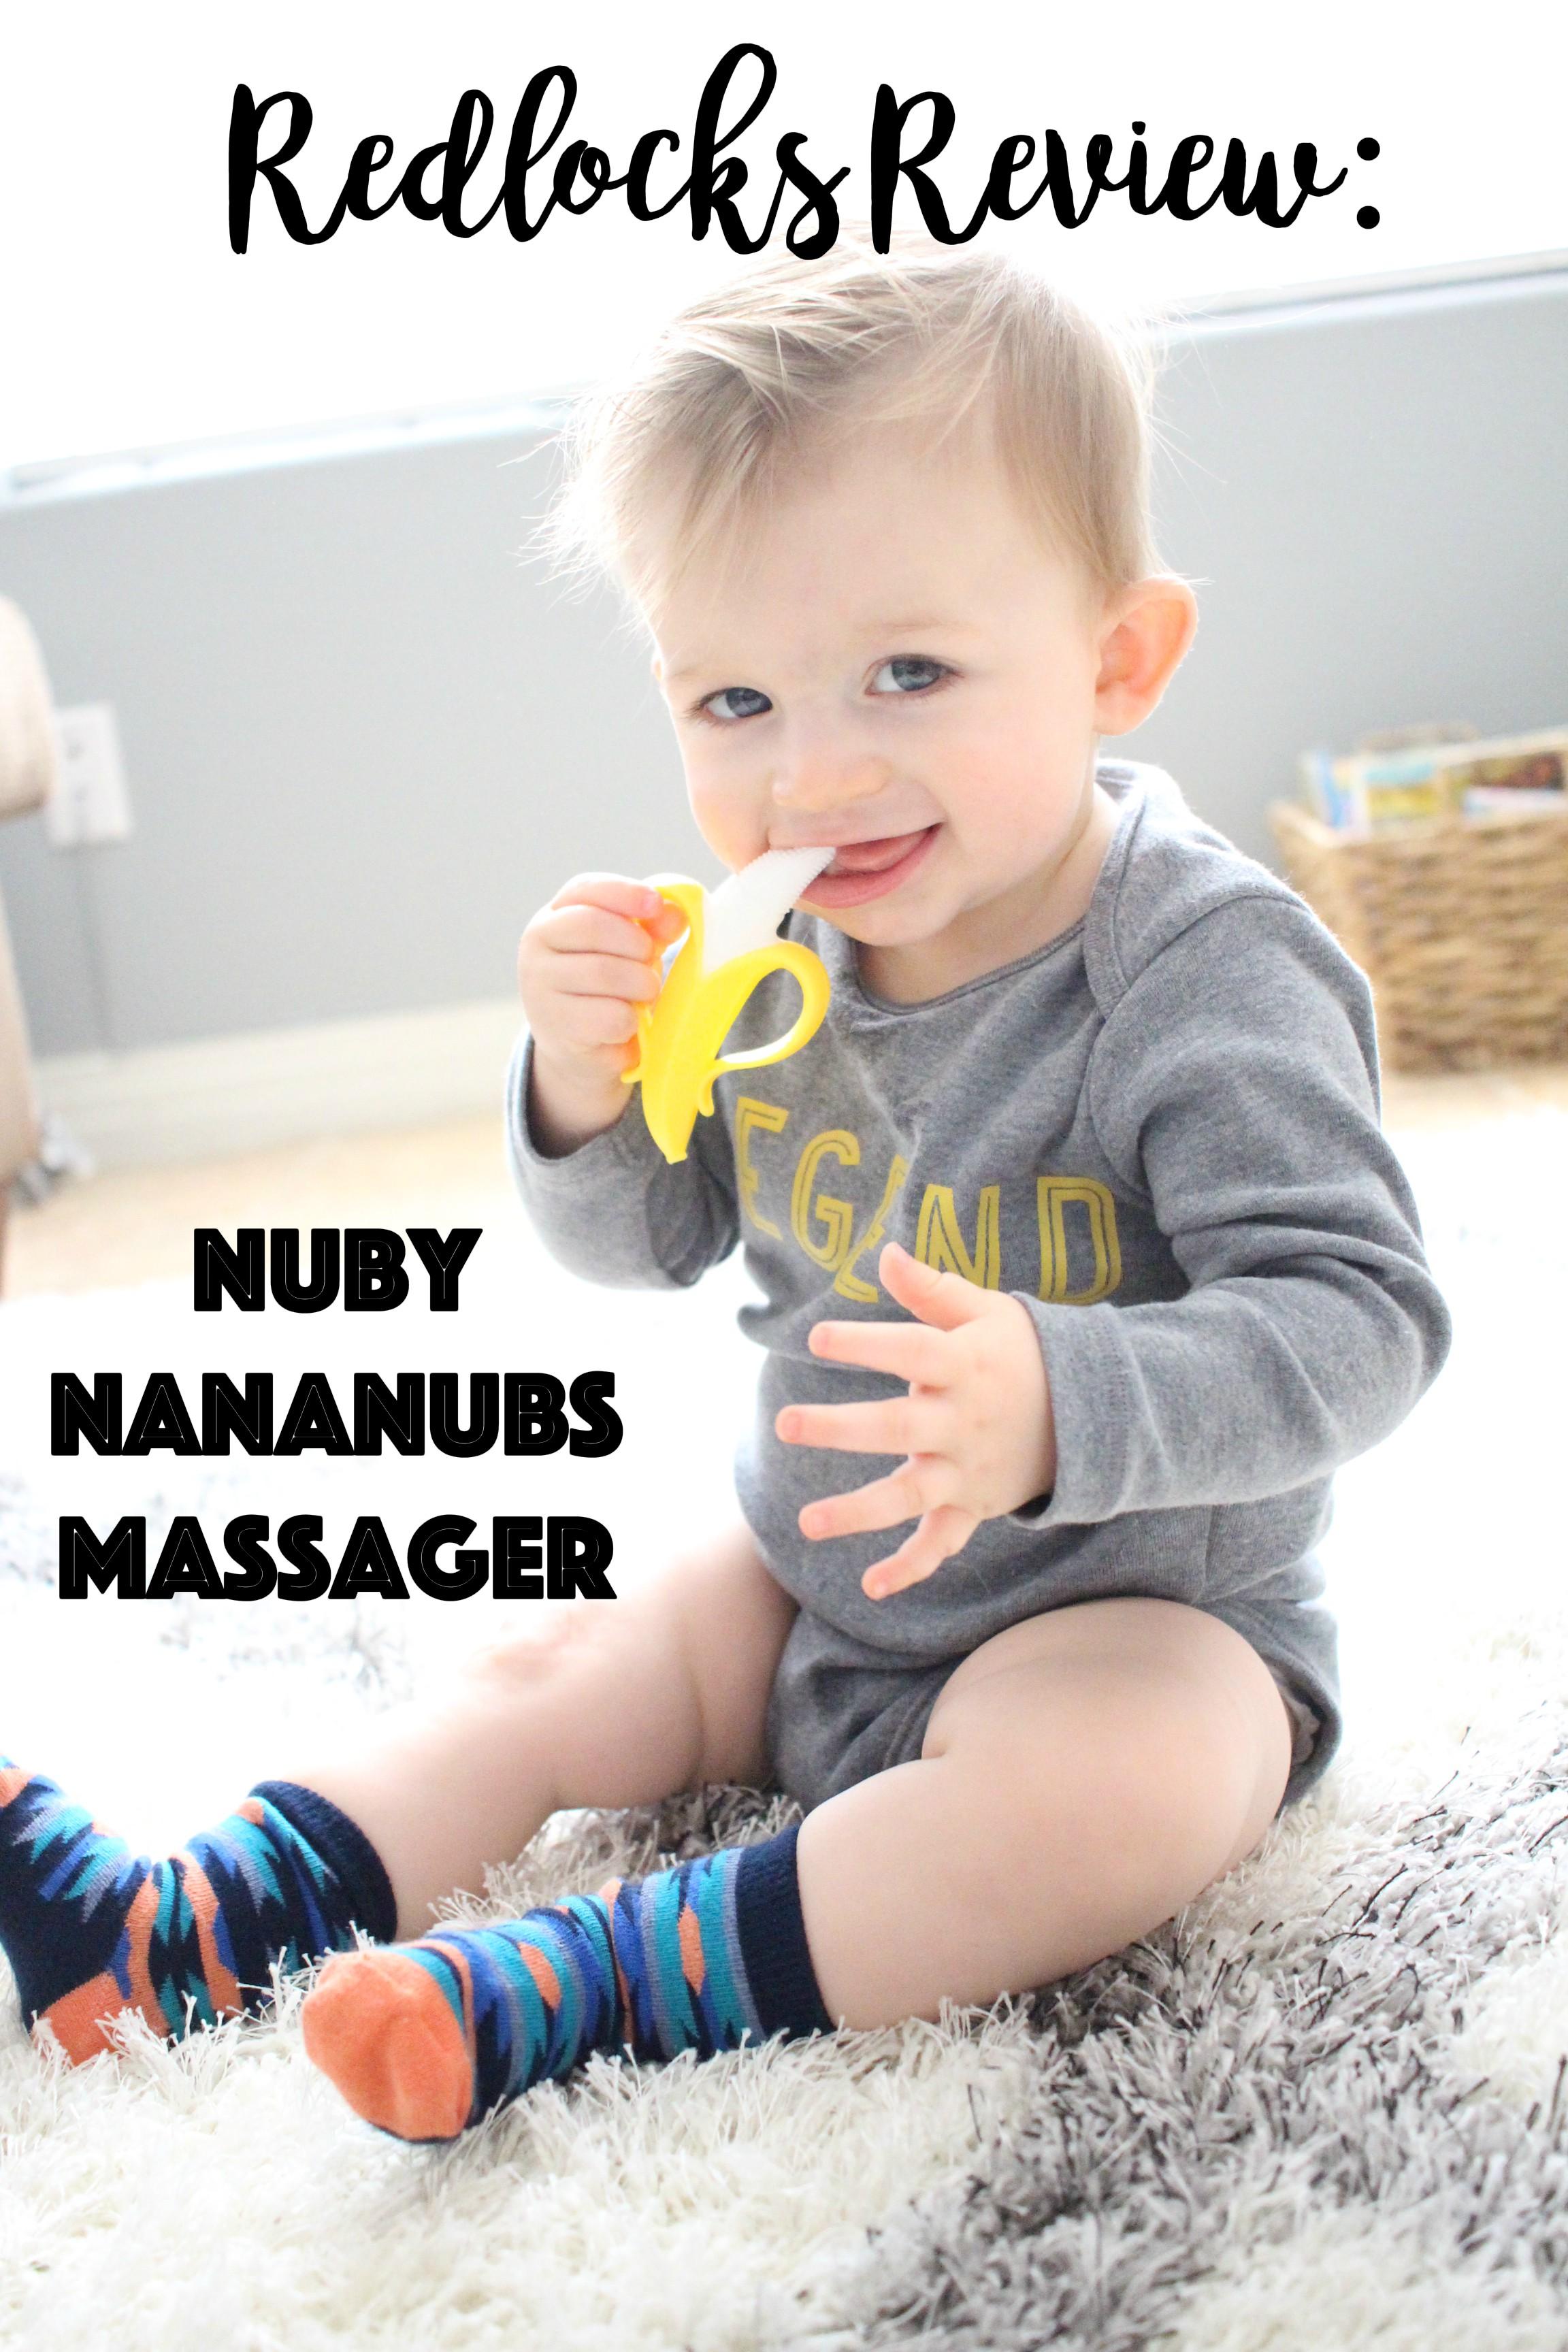 Redlocks Review: Nuby NanaNubs Massager